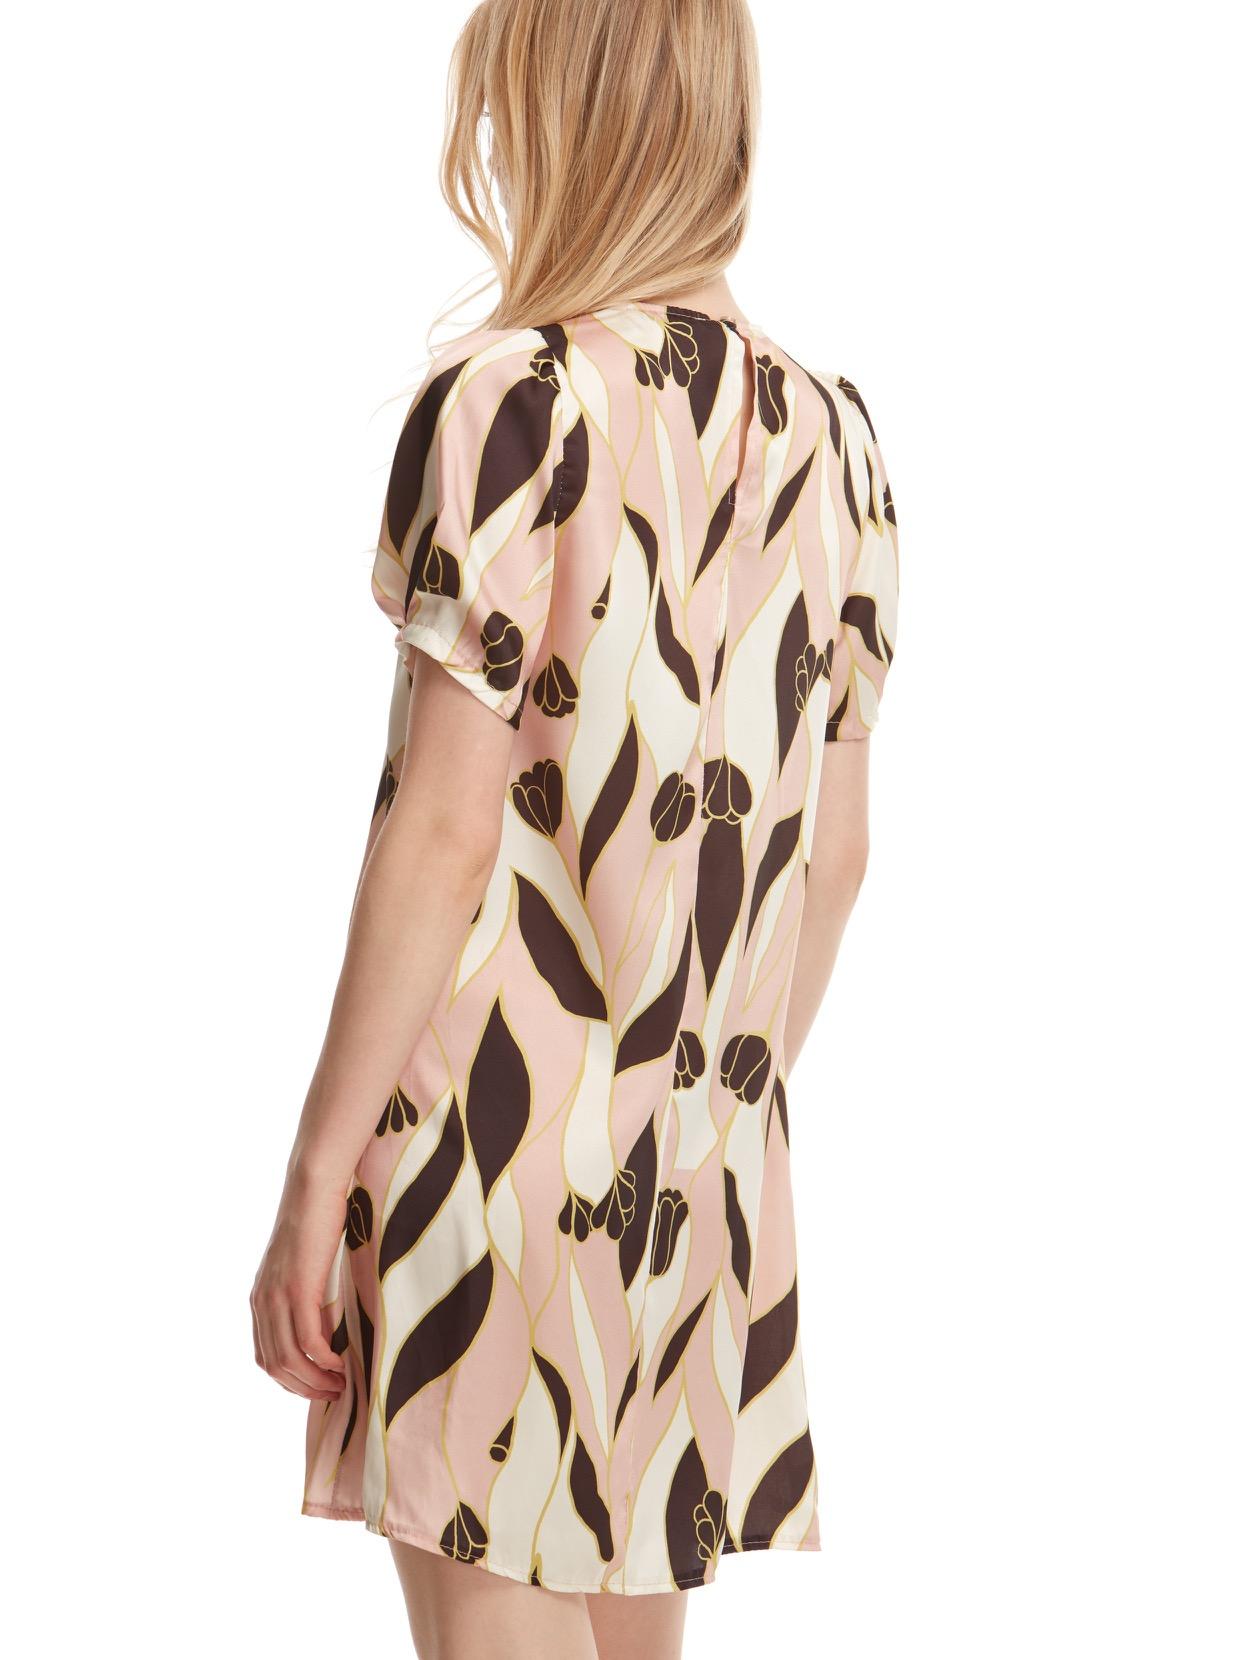 dress180322506_NUDE_DRESS_ 39.jpg